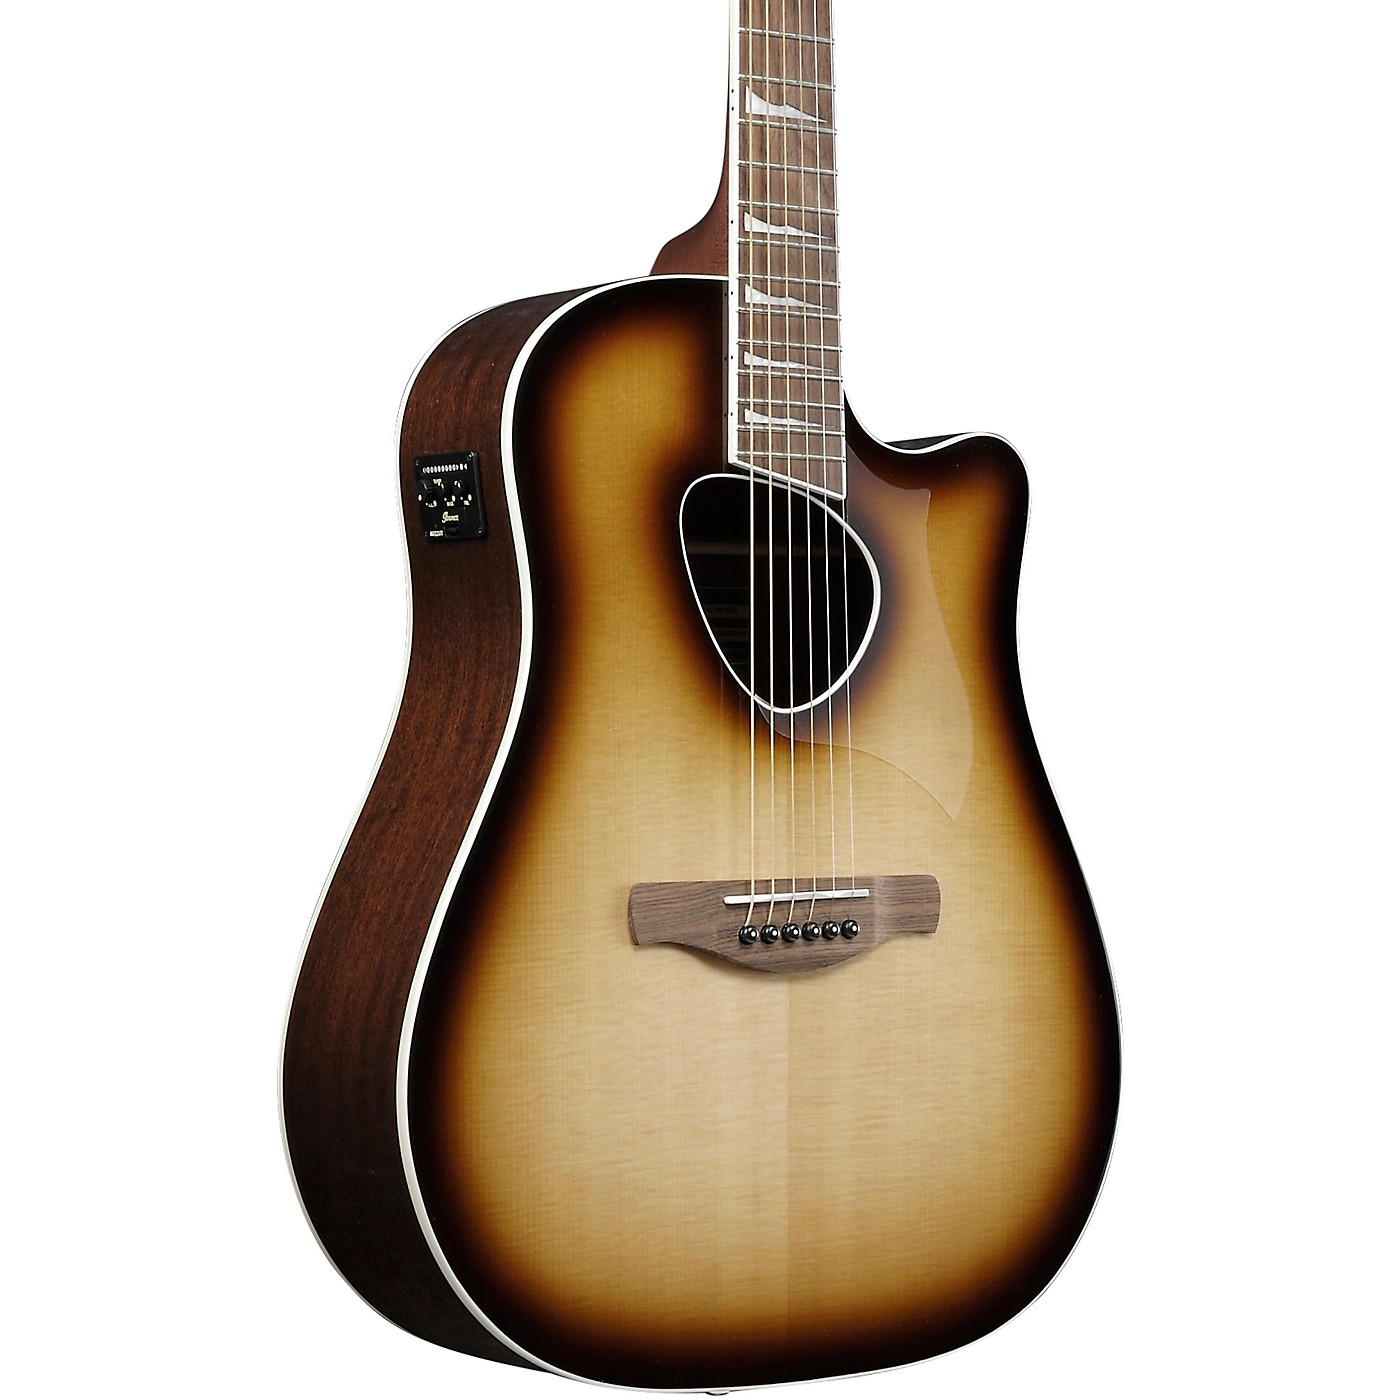 Ibanez ALT30 Altstar Dreadnought Acoustic-Electric Guitar thumbnail